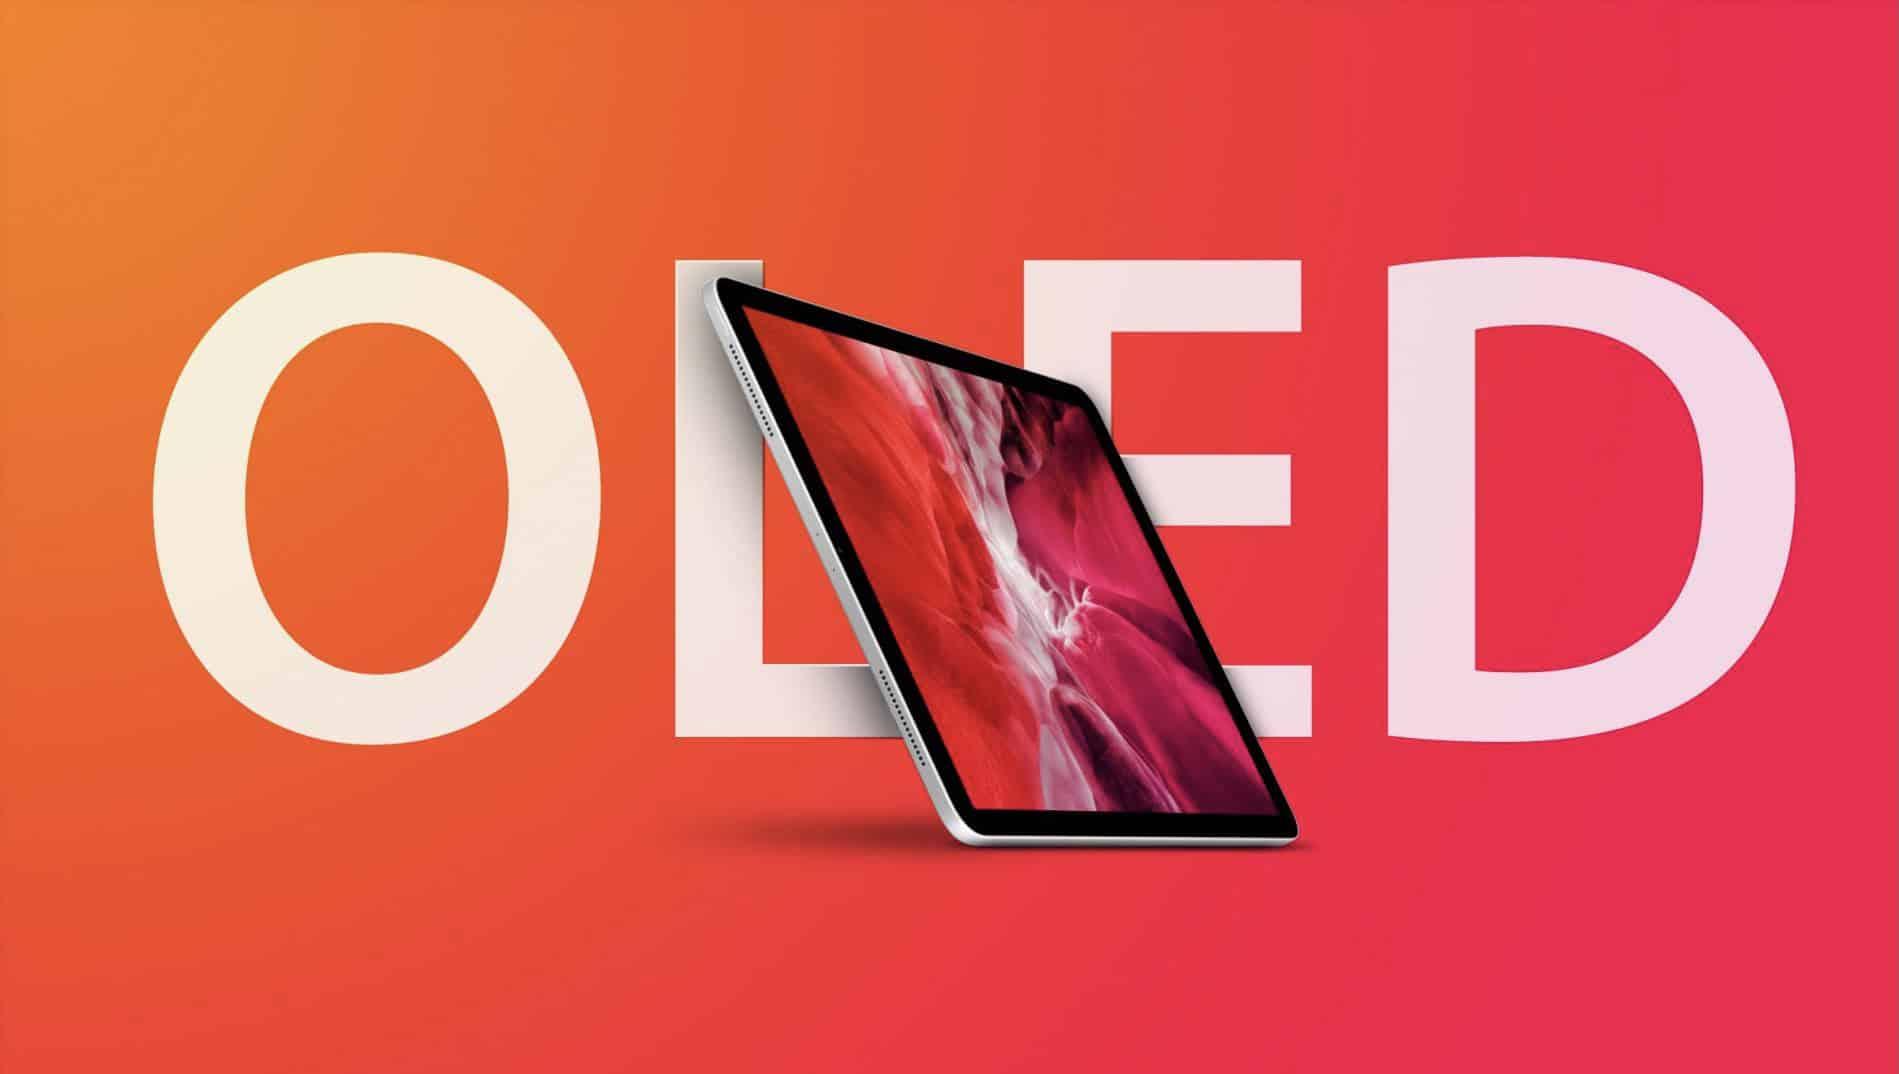 iPad Air OLED